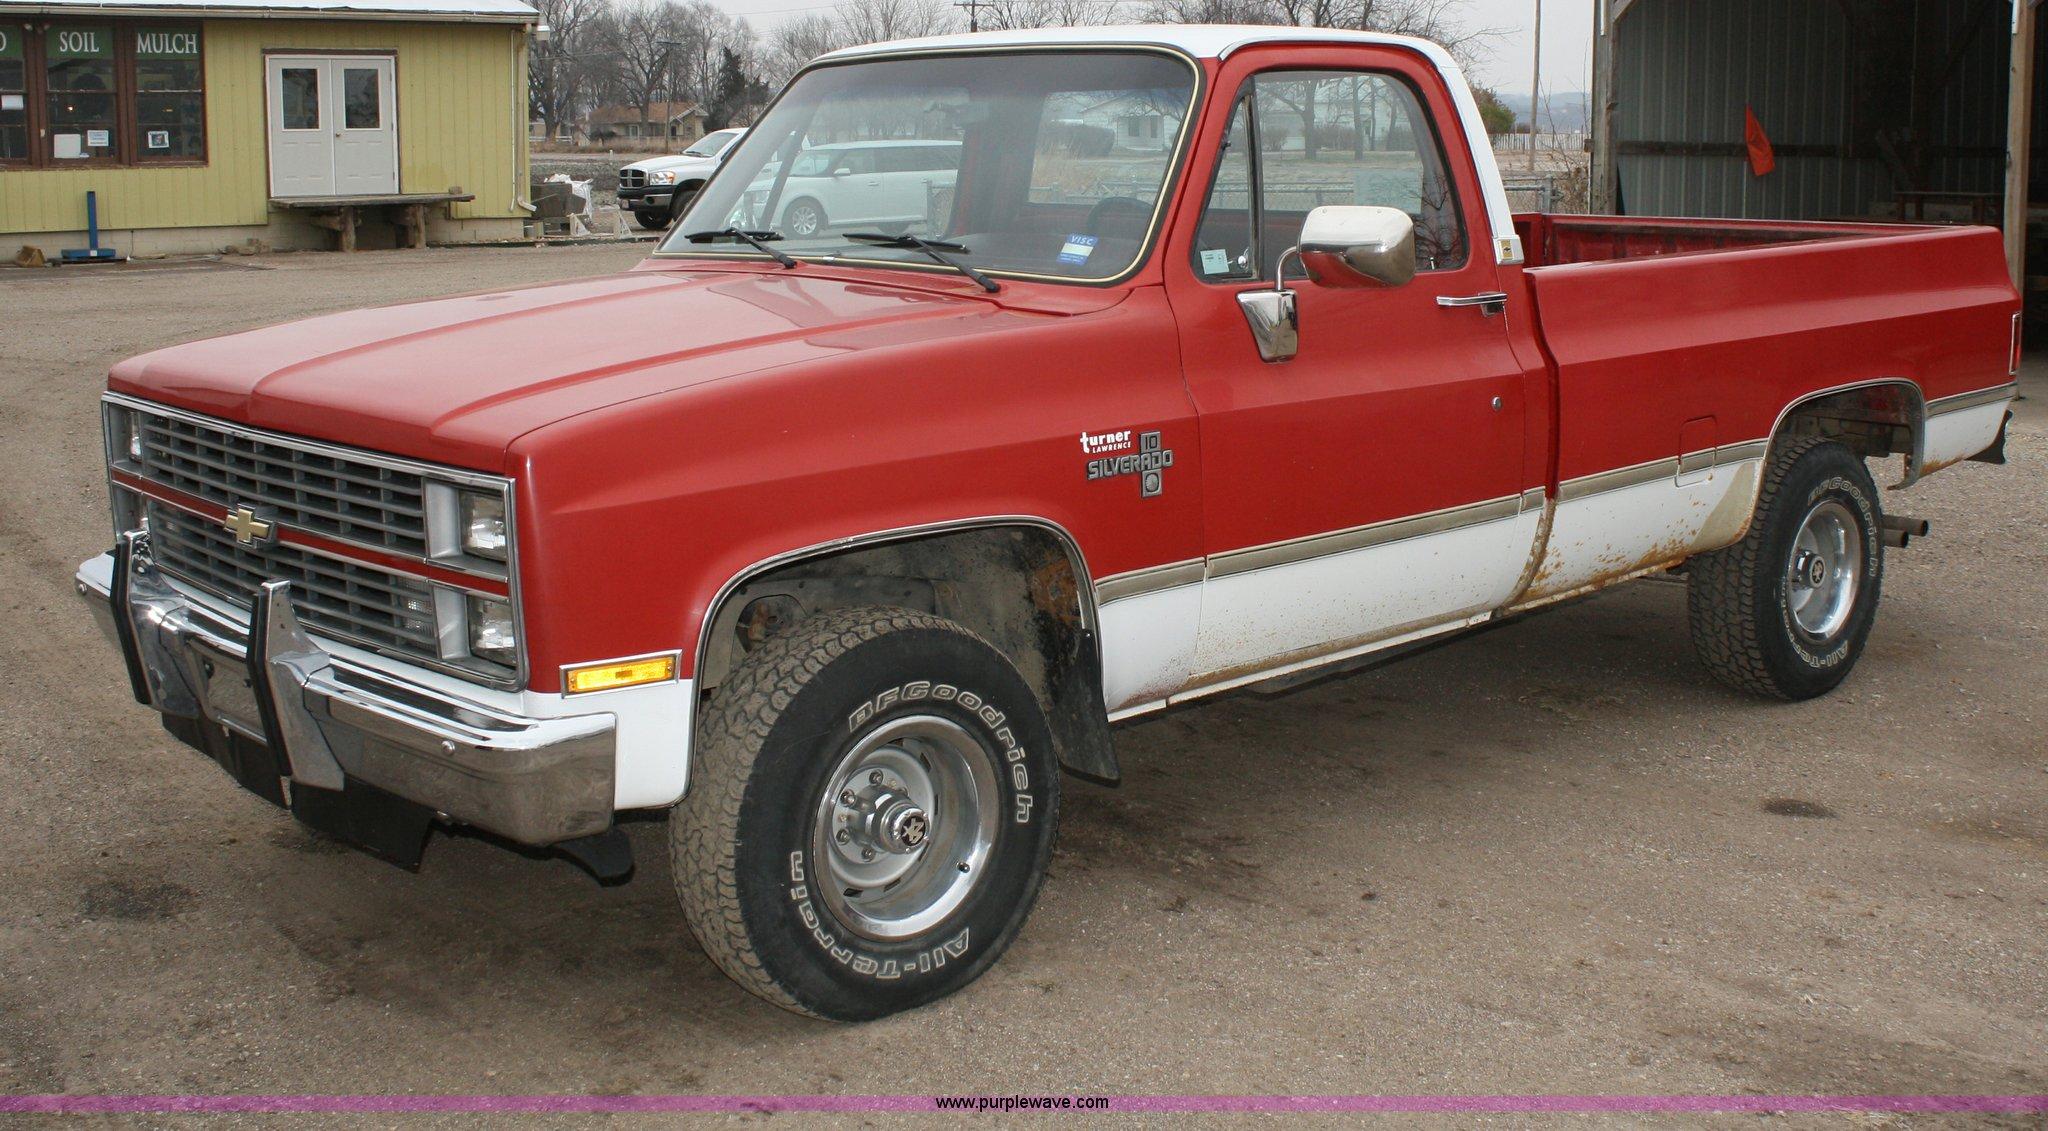 1984 chevrolet k10 silverado pickup truck item a6564 sol. Black Bedroom Furniture Sets. Home Design Ideas